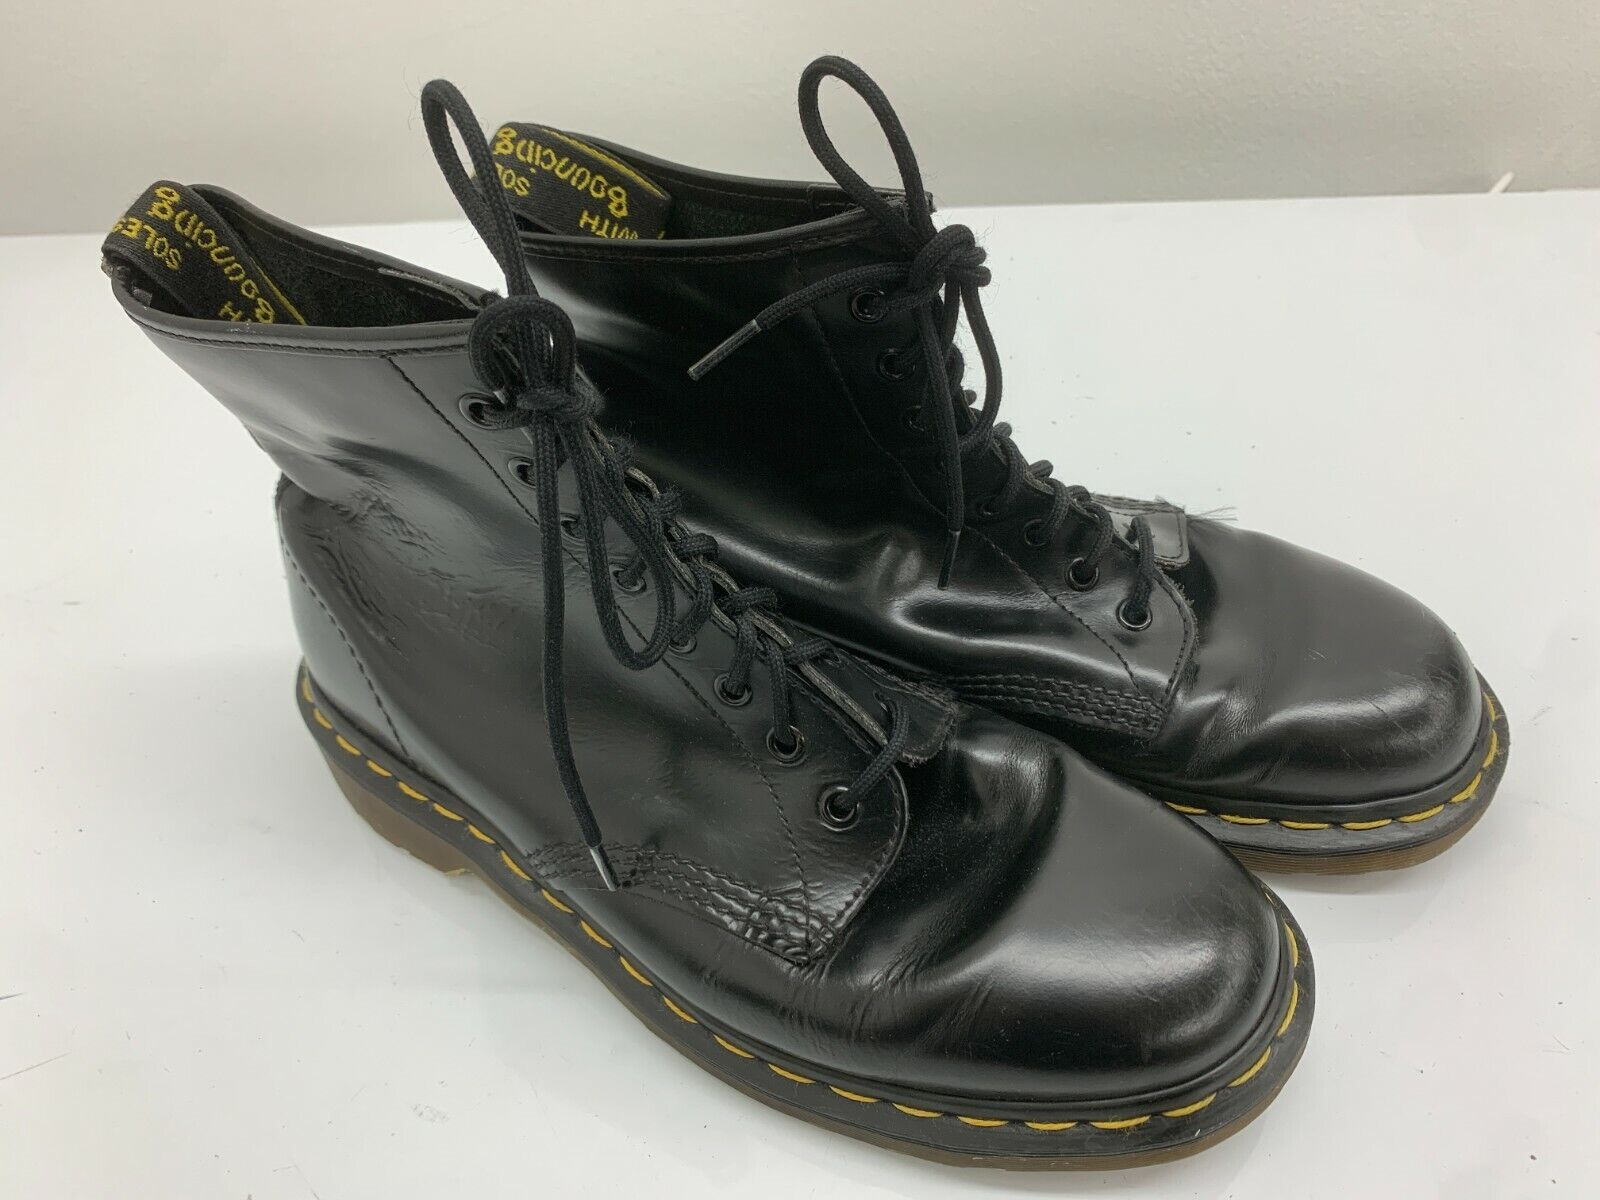 Dr Doc Martens Boots, Size 9UK, Black Shiny, 8 Eyelet, Docs Rare